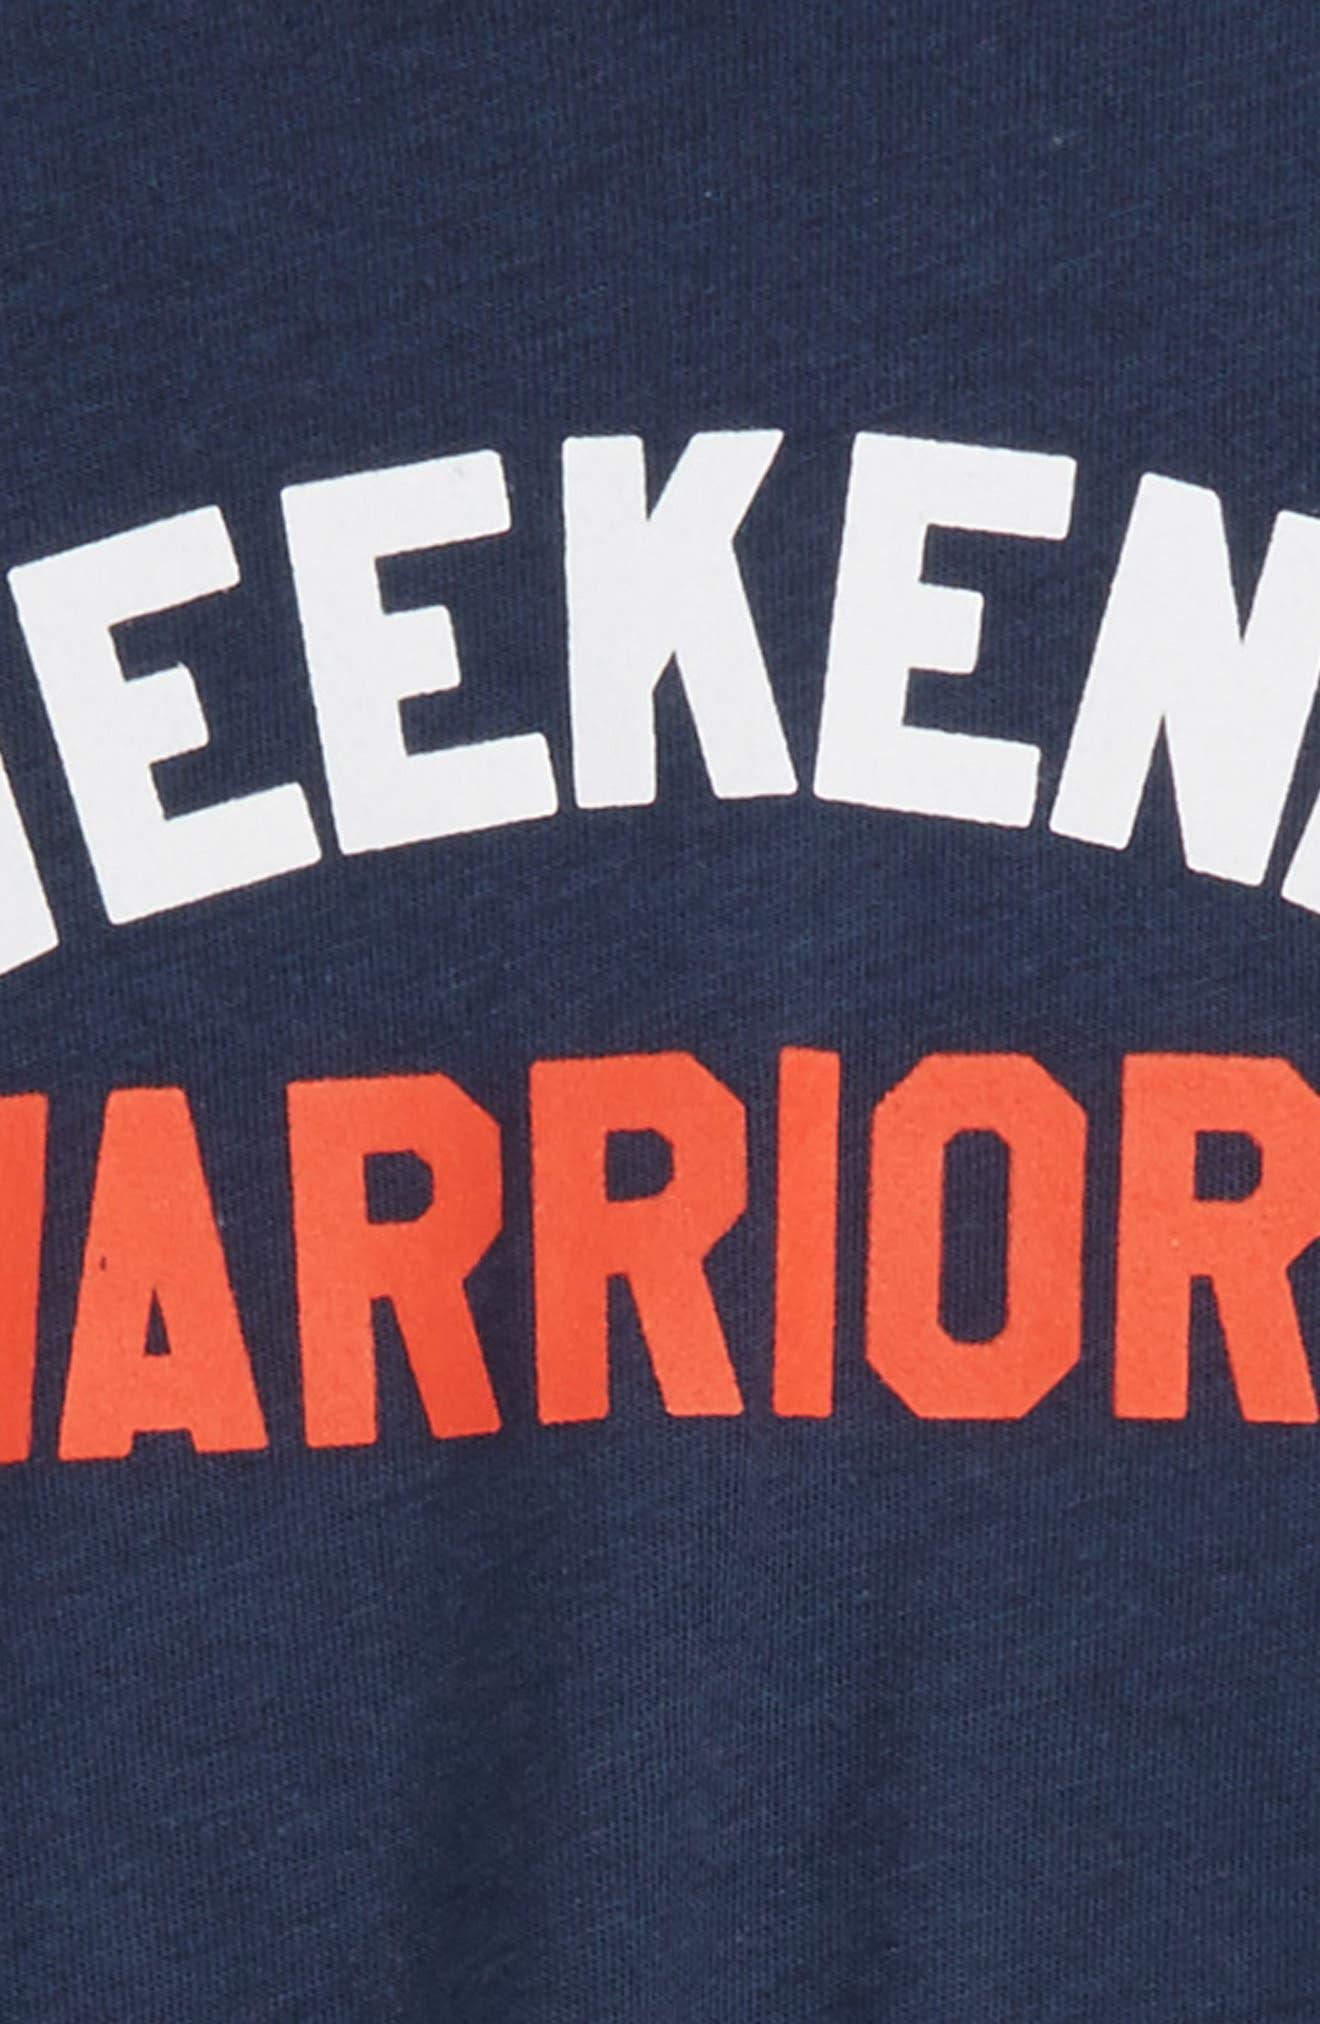 Weekend Warriors Tee,                             Alternate thumbnail 2, color,                             Navy